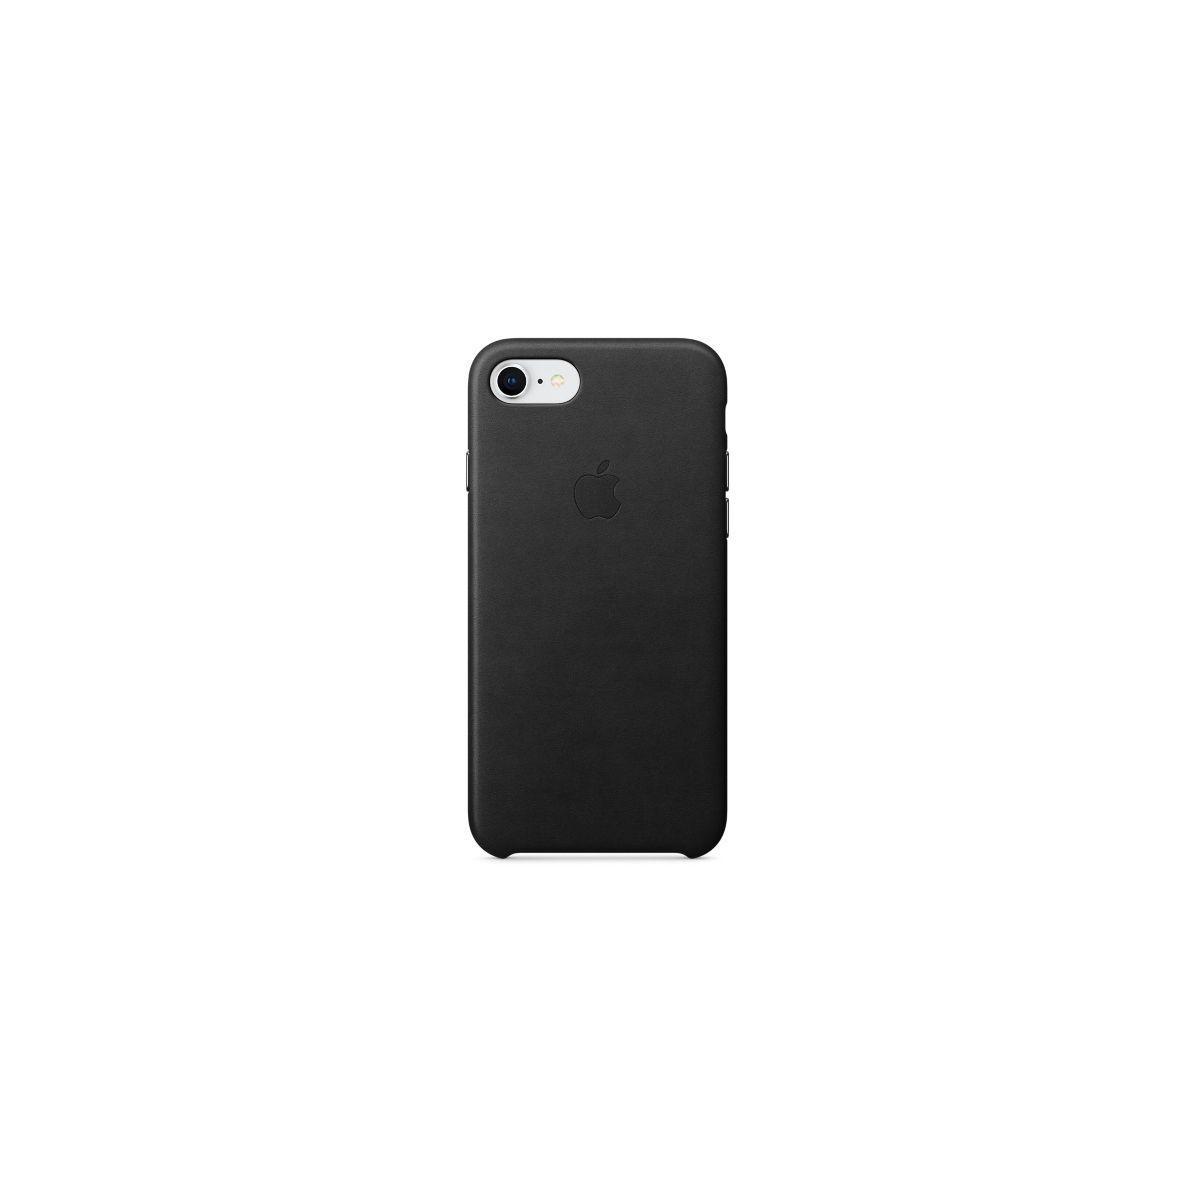 Coque apple iphone 7/8 cuir noir